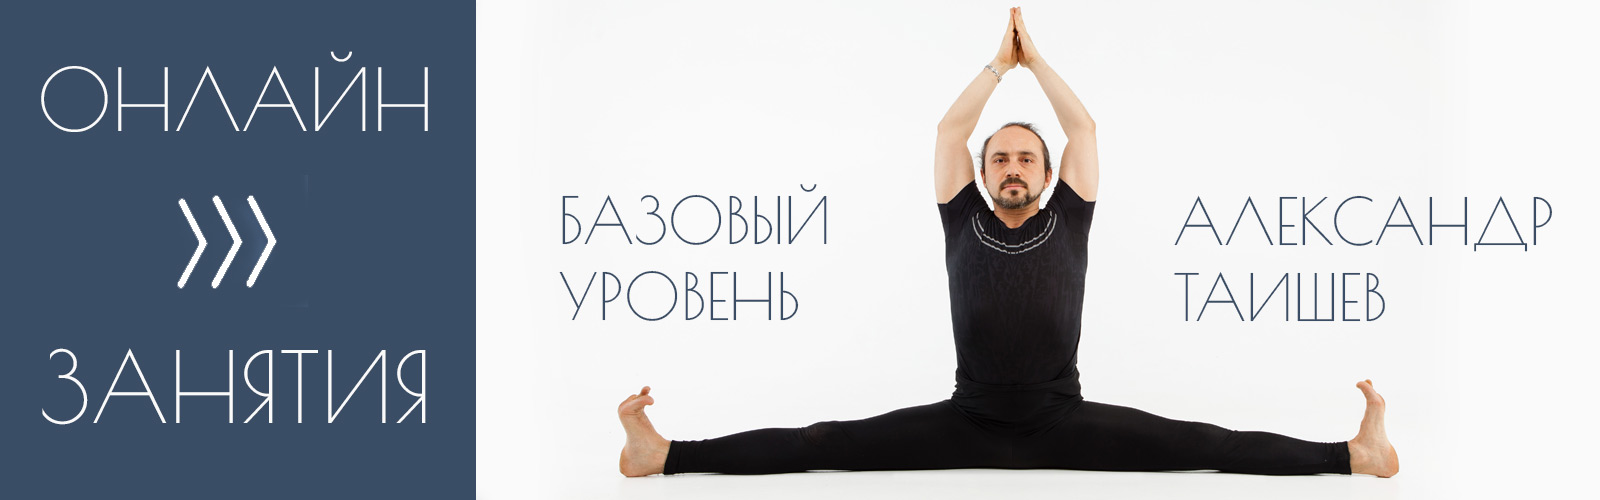 онлайн занятия Таишев